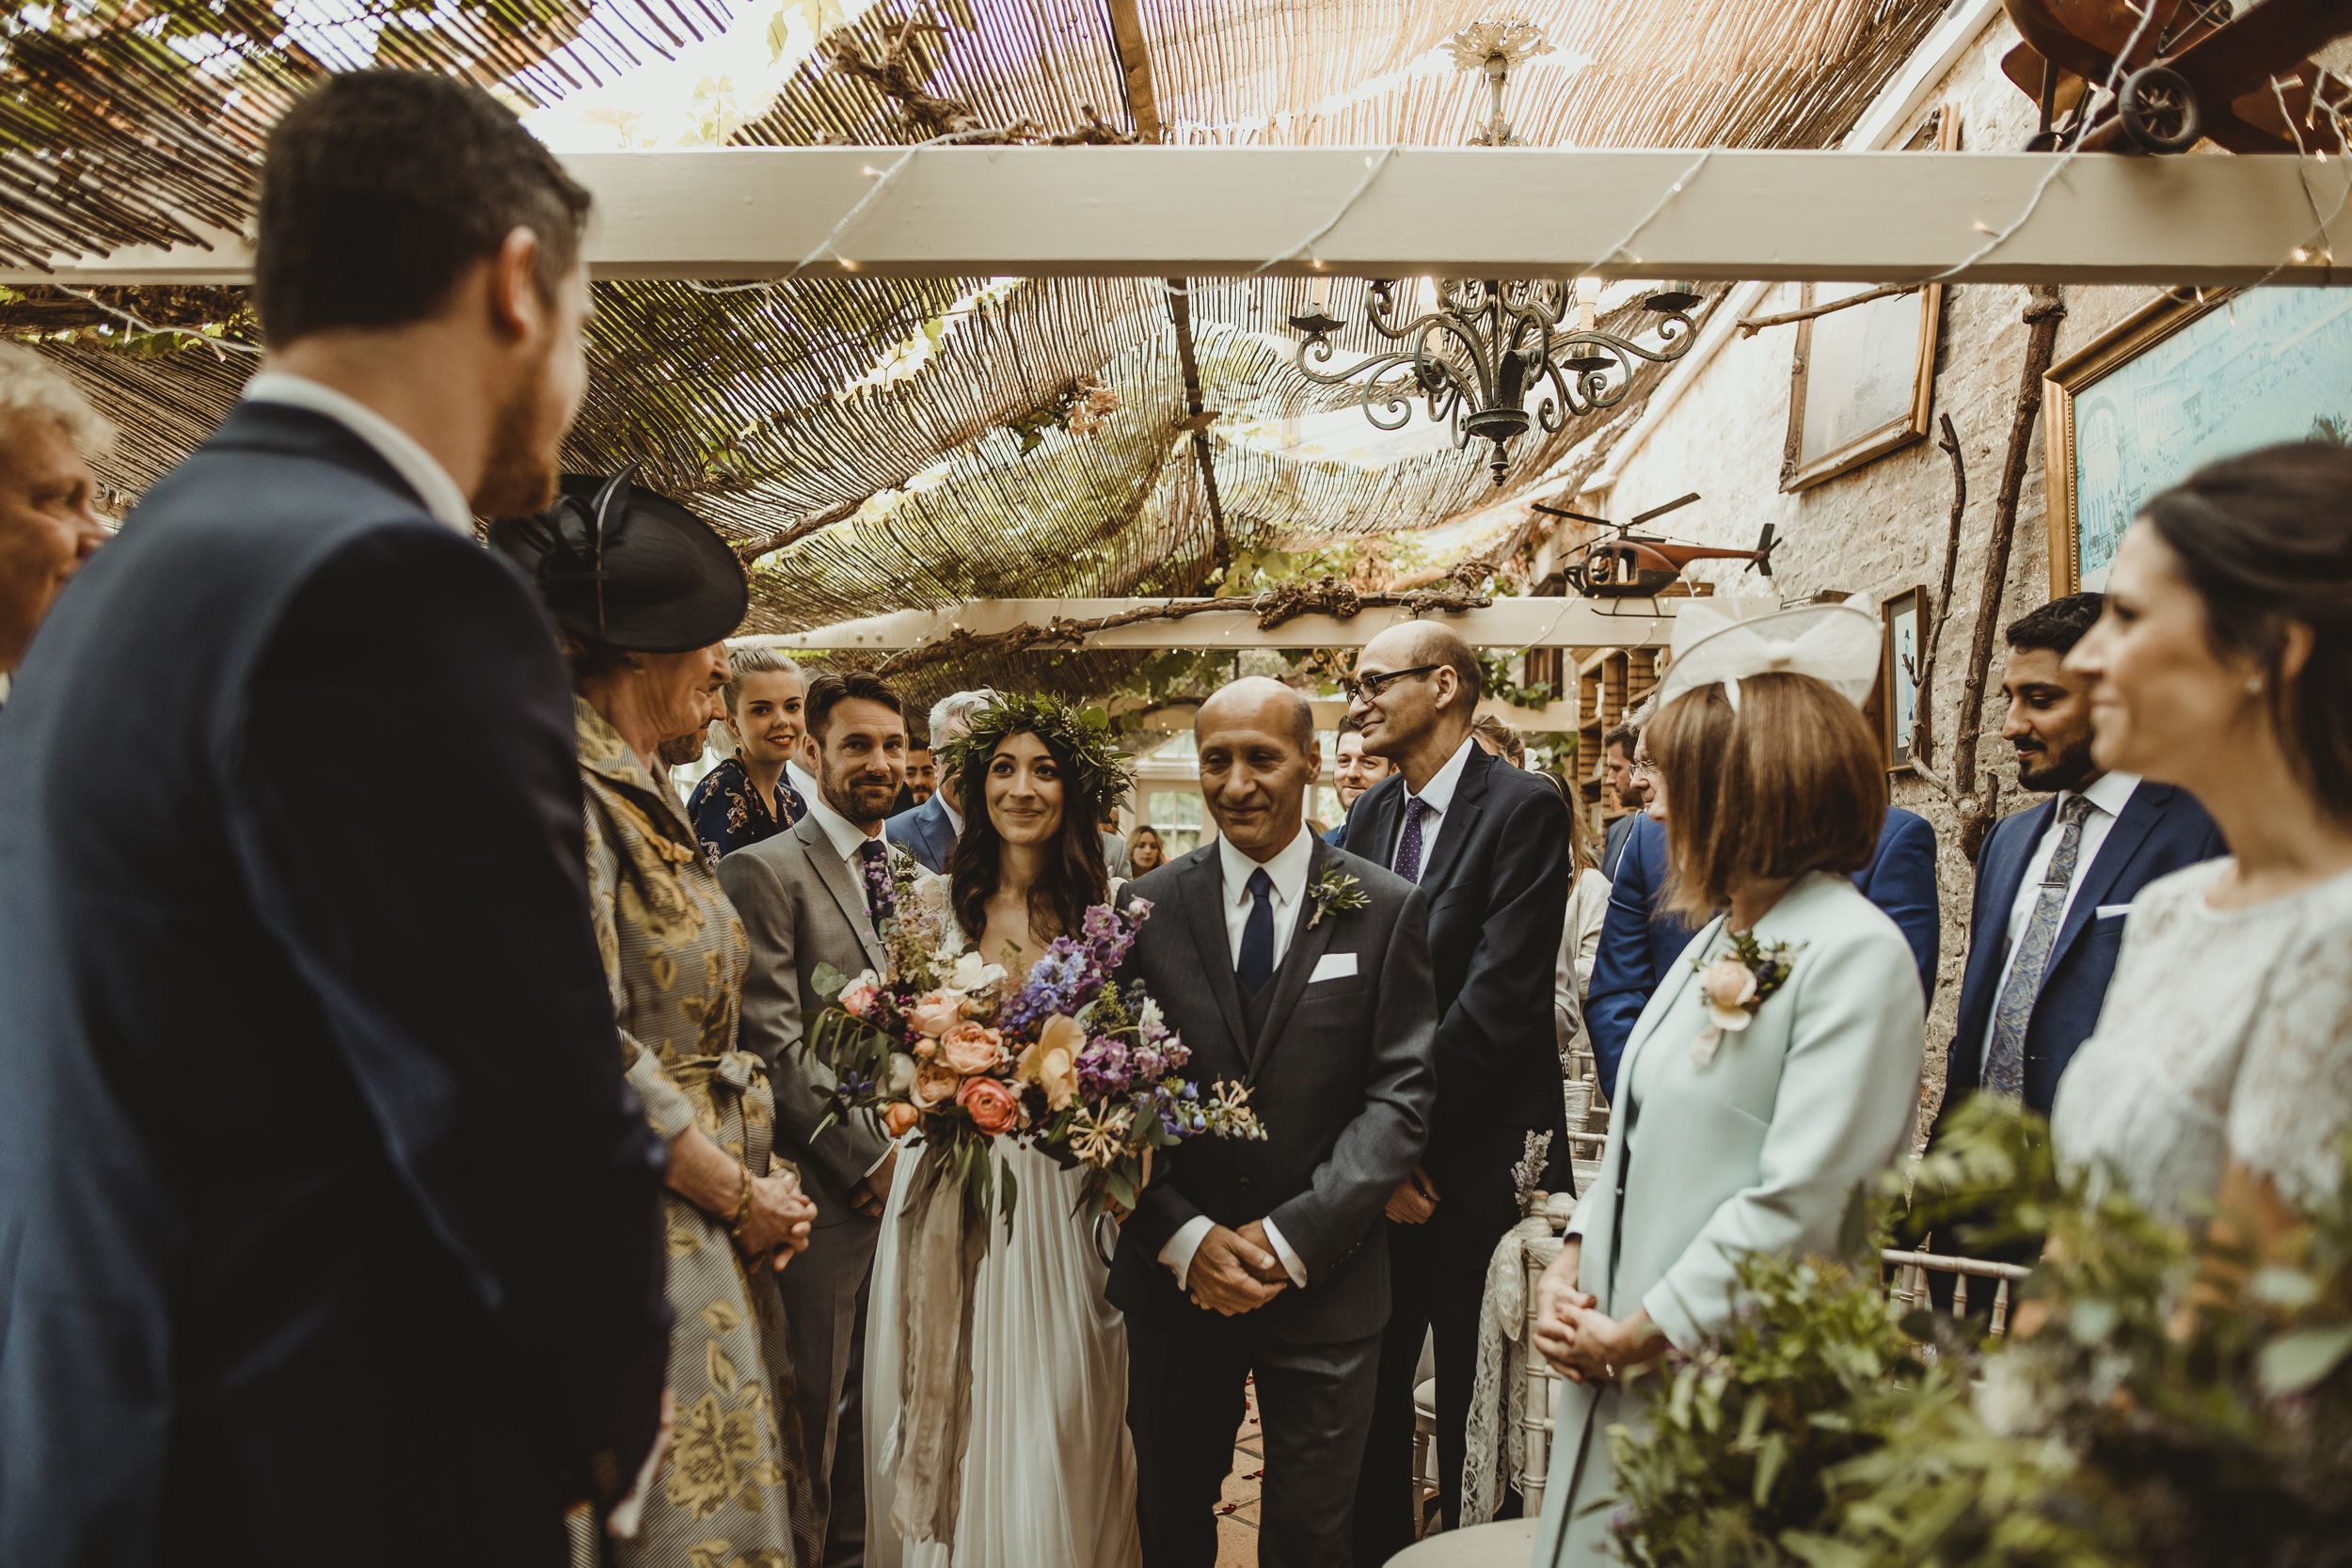 N&J_YORKSHIRE_WEDDING_PHOTOGRAPHER_MALTON_LEEDS_SHEFFIELD-414.JPG